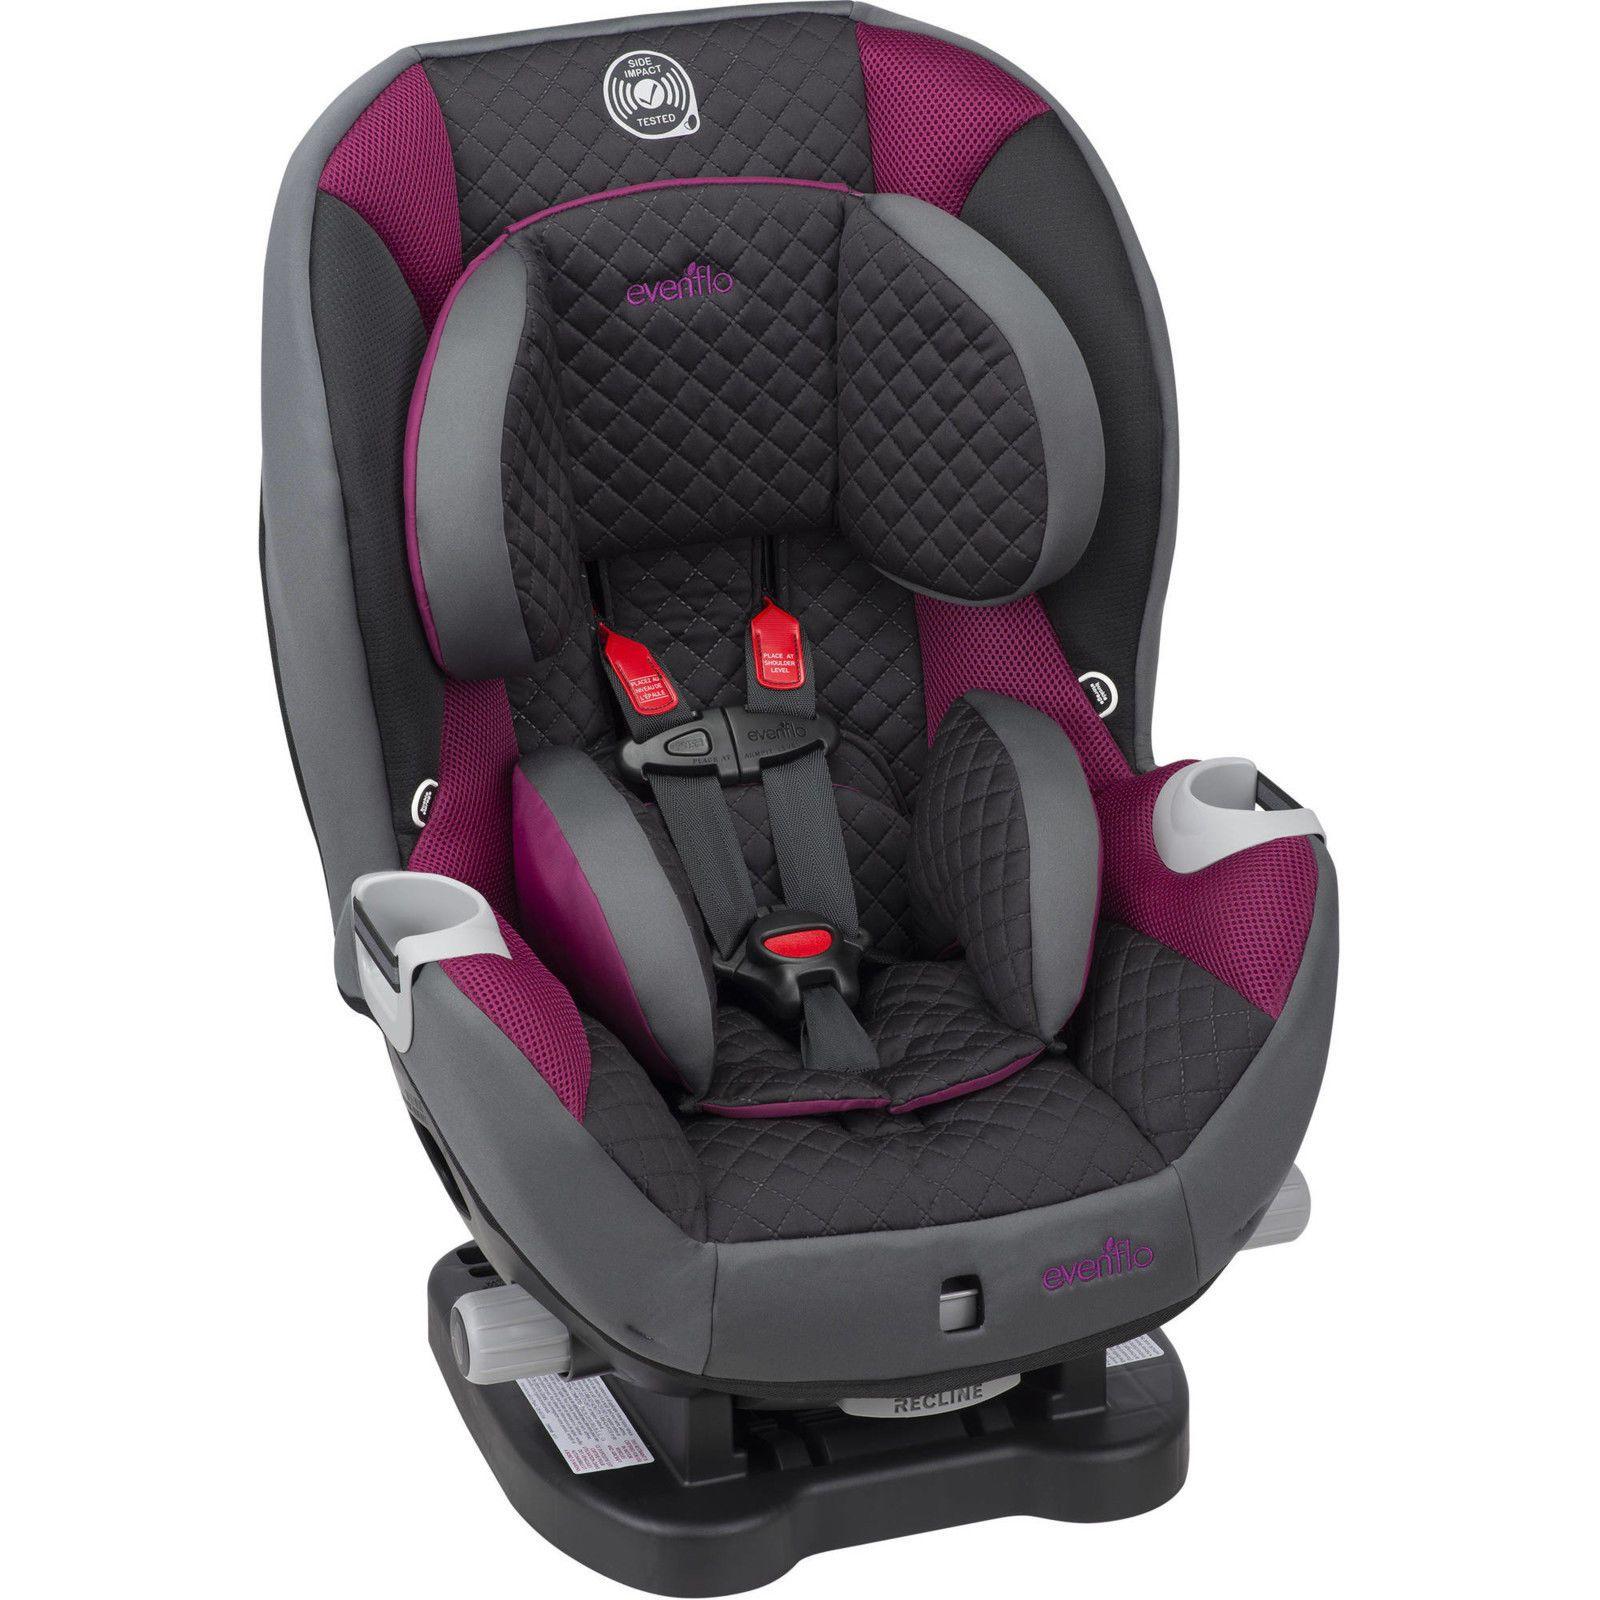 Advanced Triumph Convertible Car Seat Toddler Adjustable